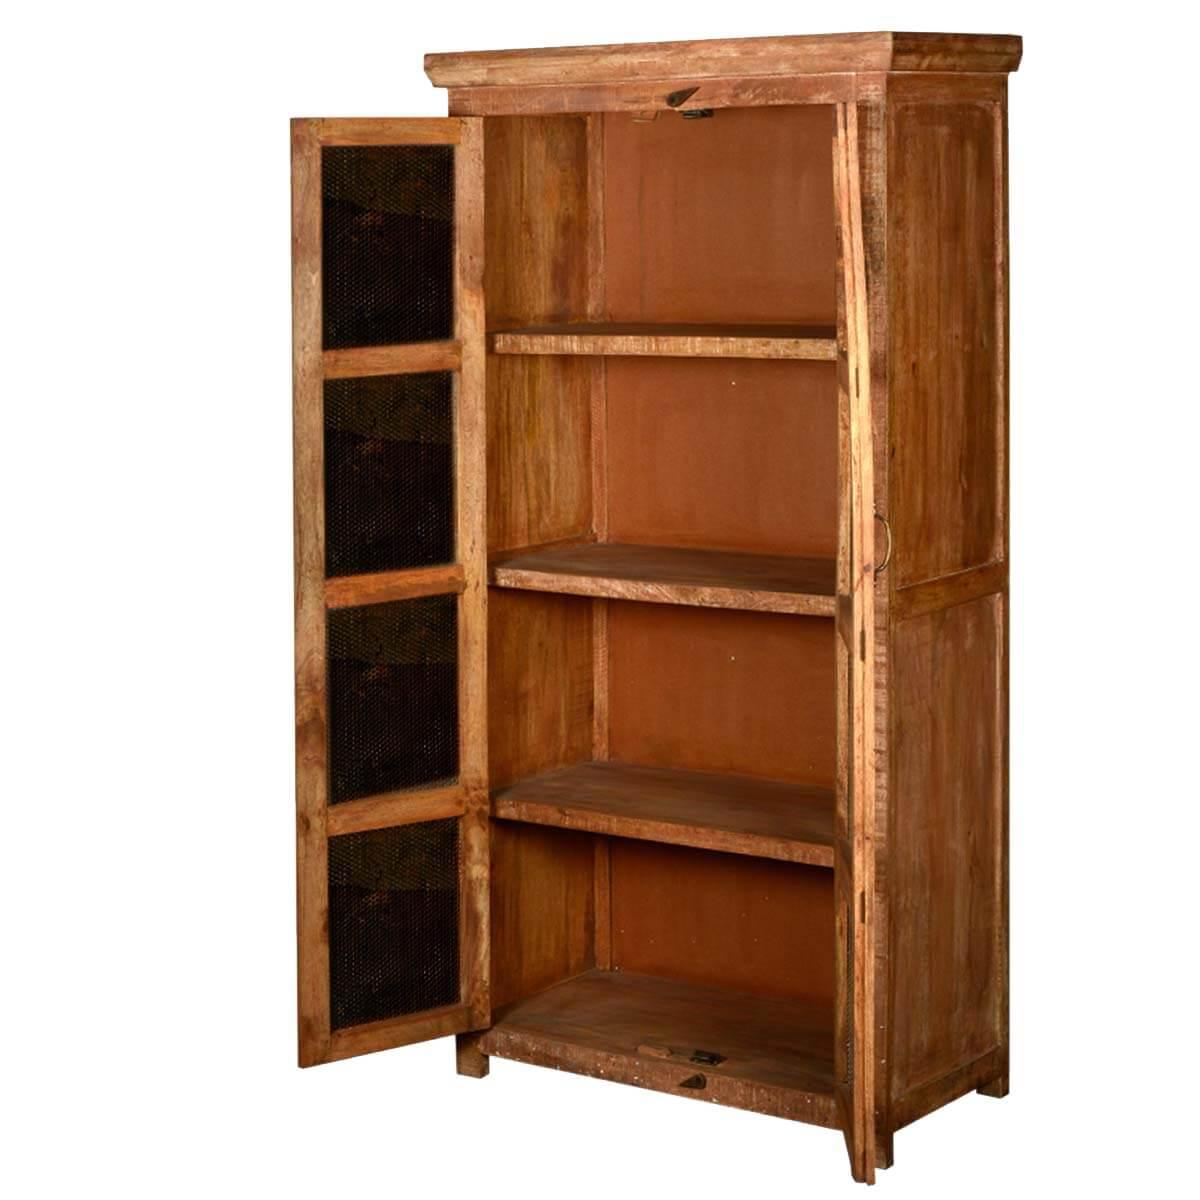 Metal Mesh Window Doors Reclaimed Wood Storage Cabinet Armoire